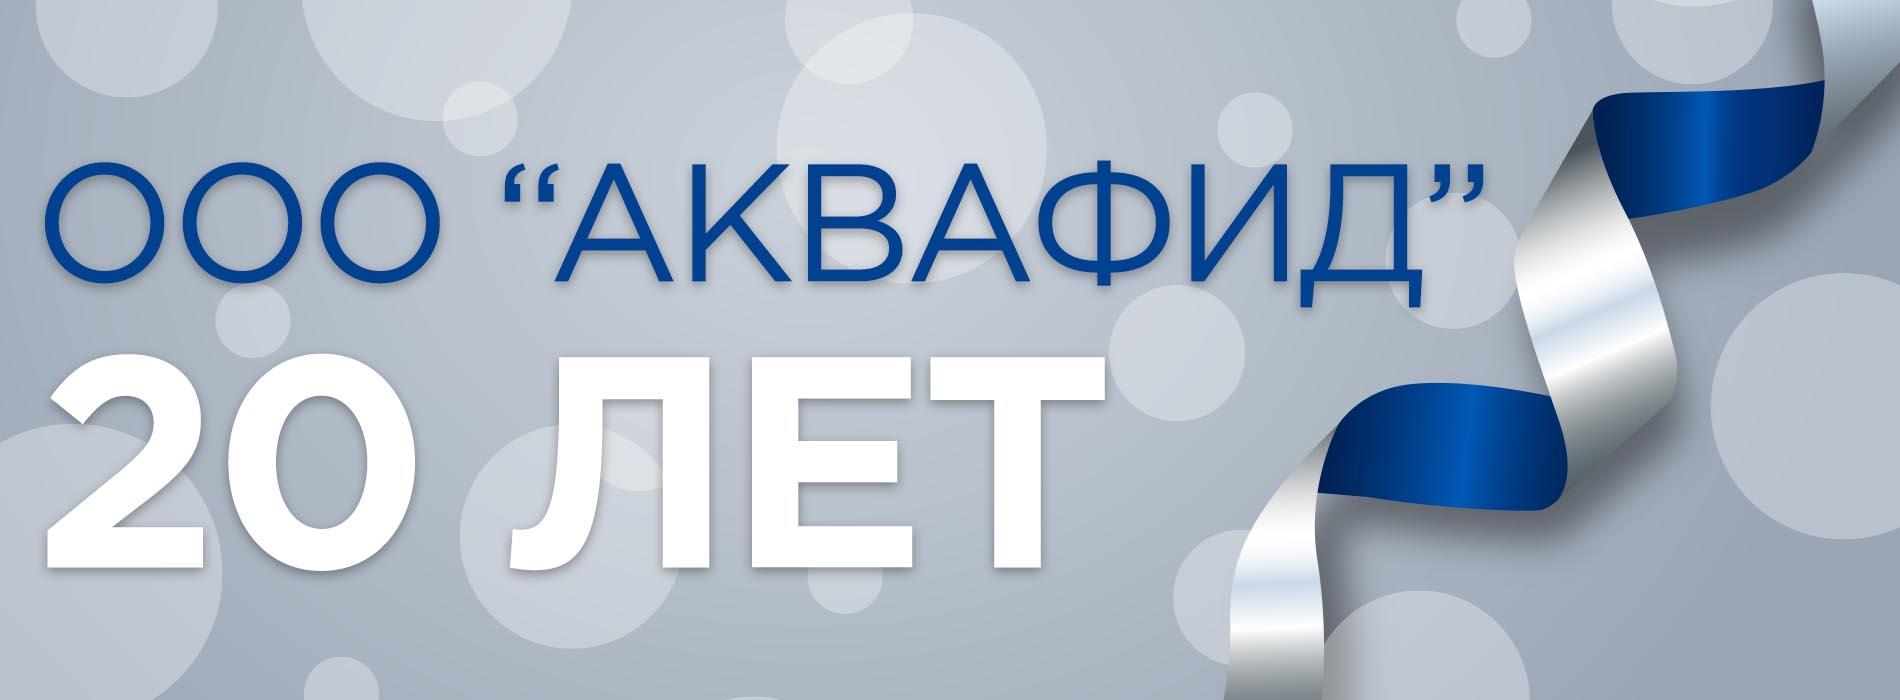 "ООО ""Аквафид"" - нам 20 лет"